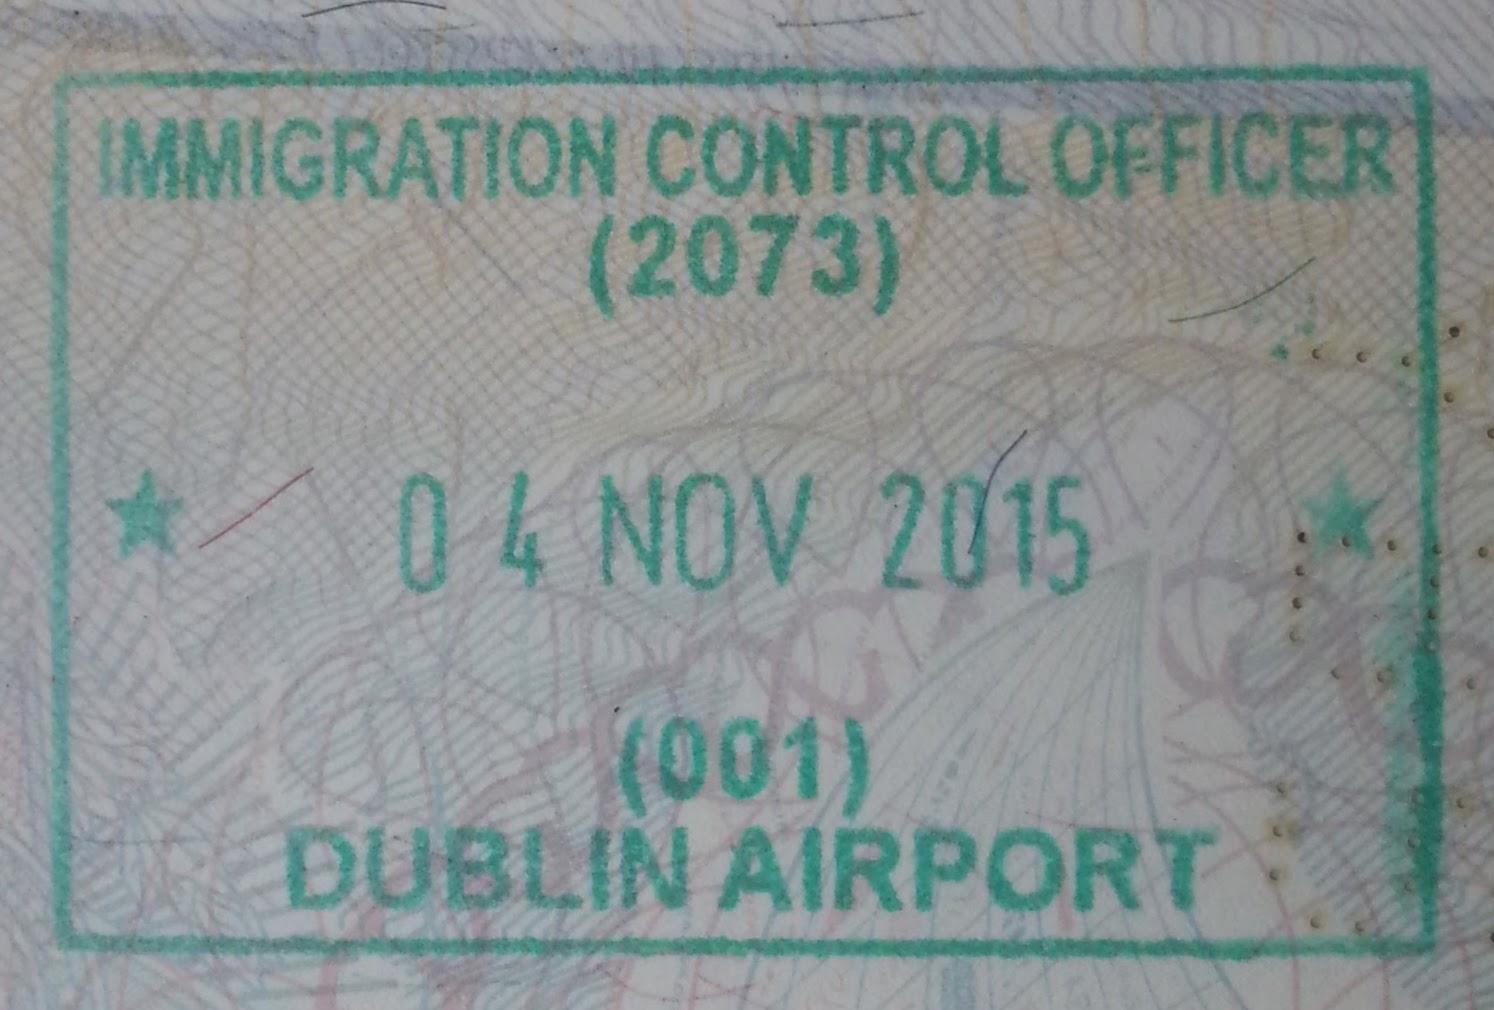 Visa policy of Ireland - Wikipedia